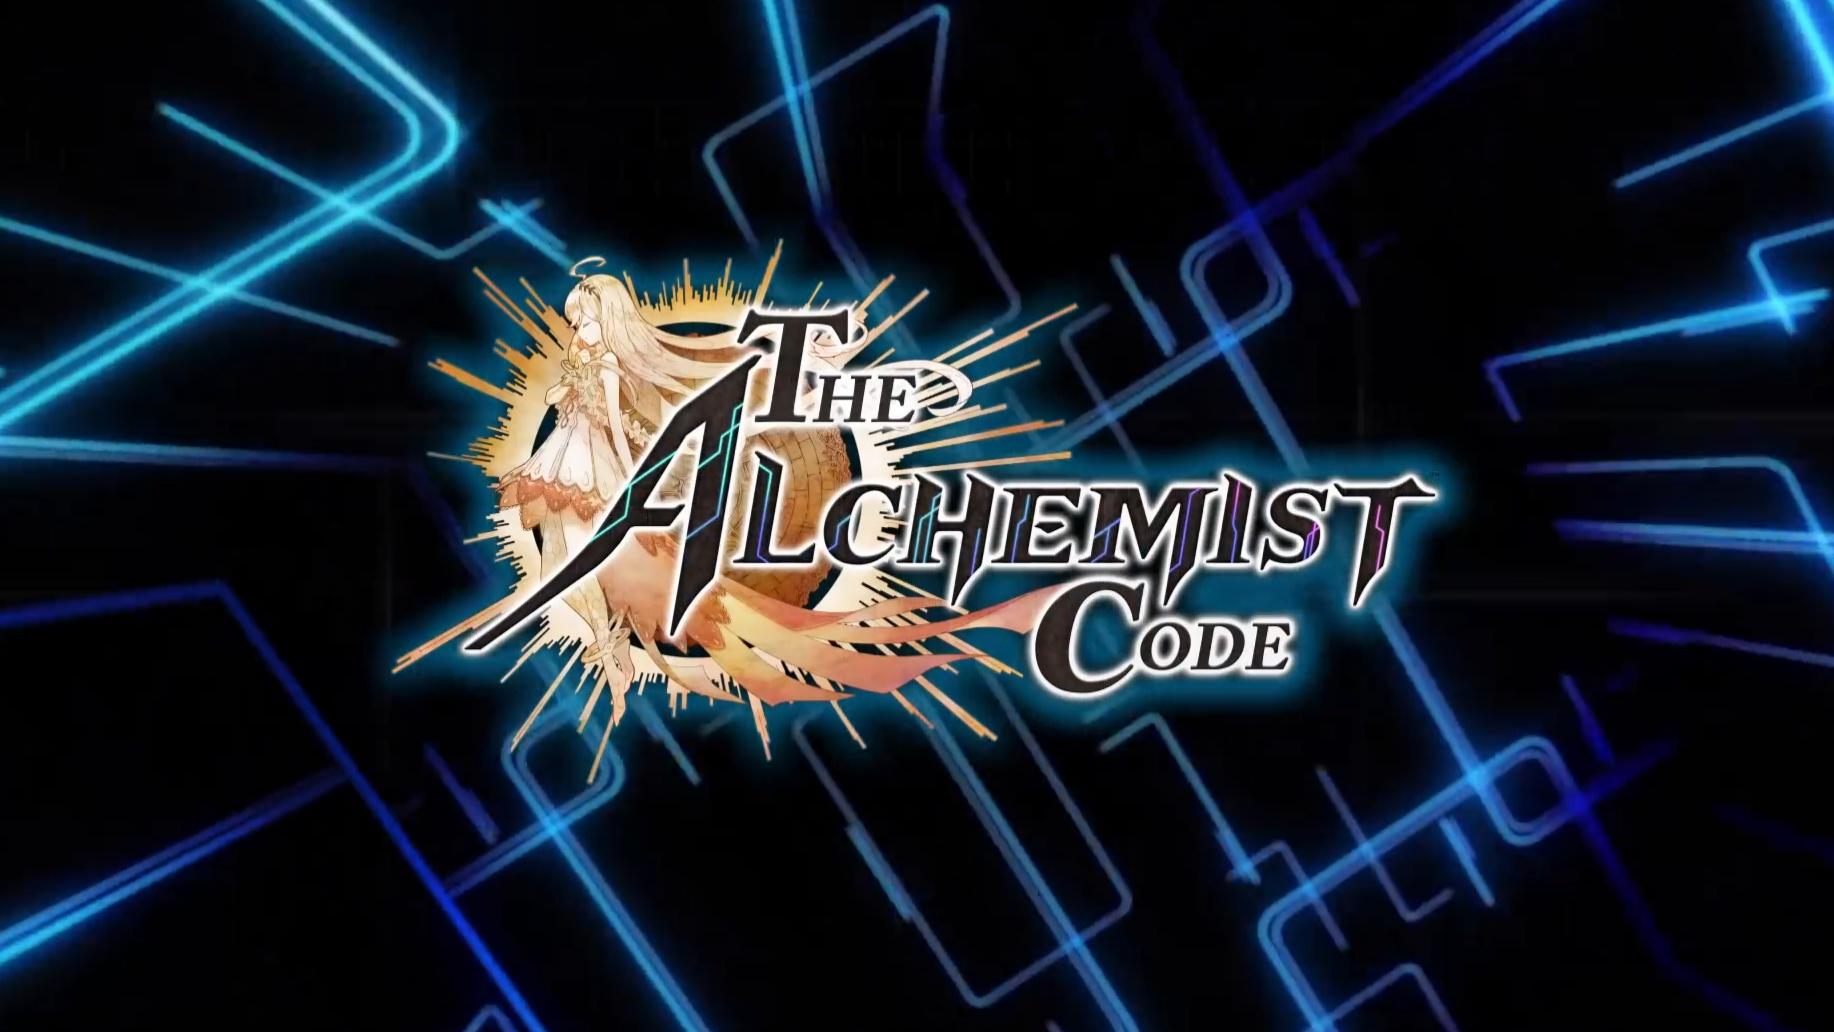 THE ALCHEMIST CODE MOD APK